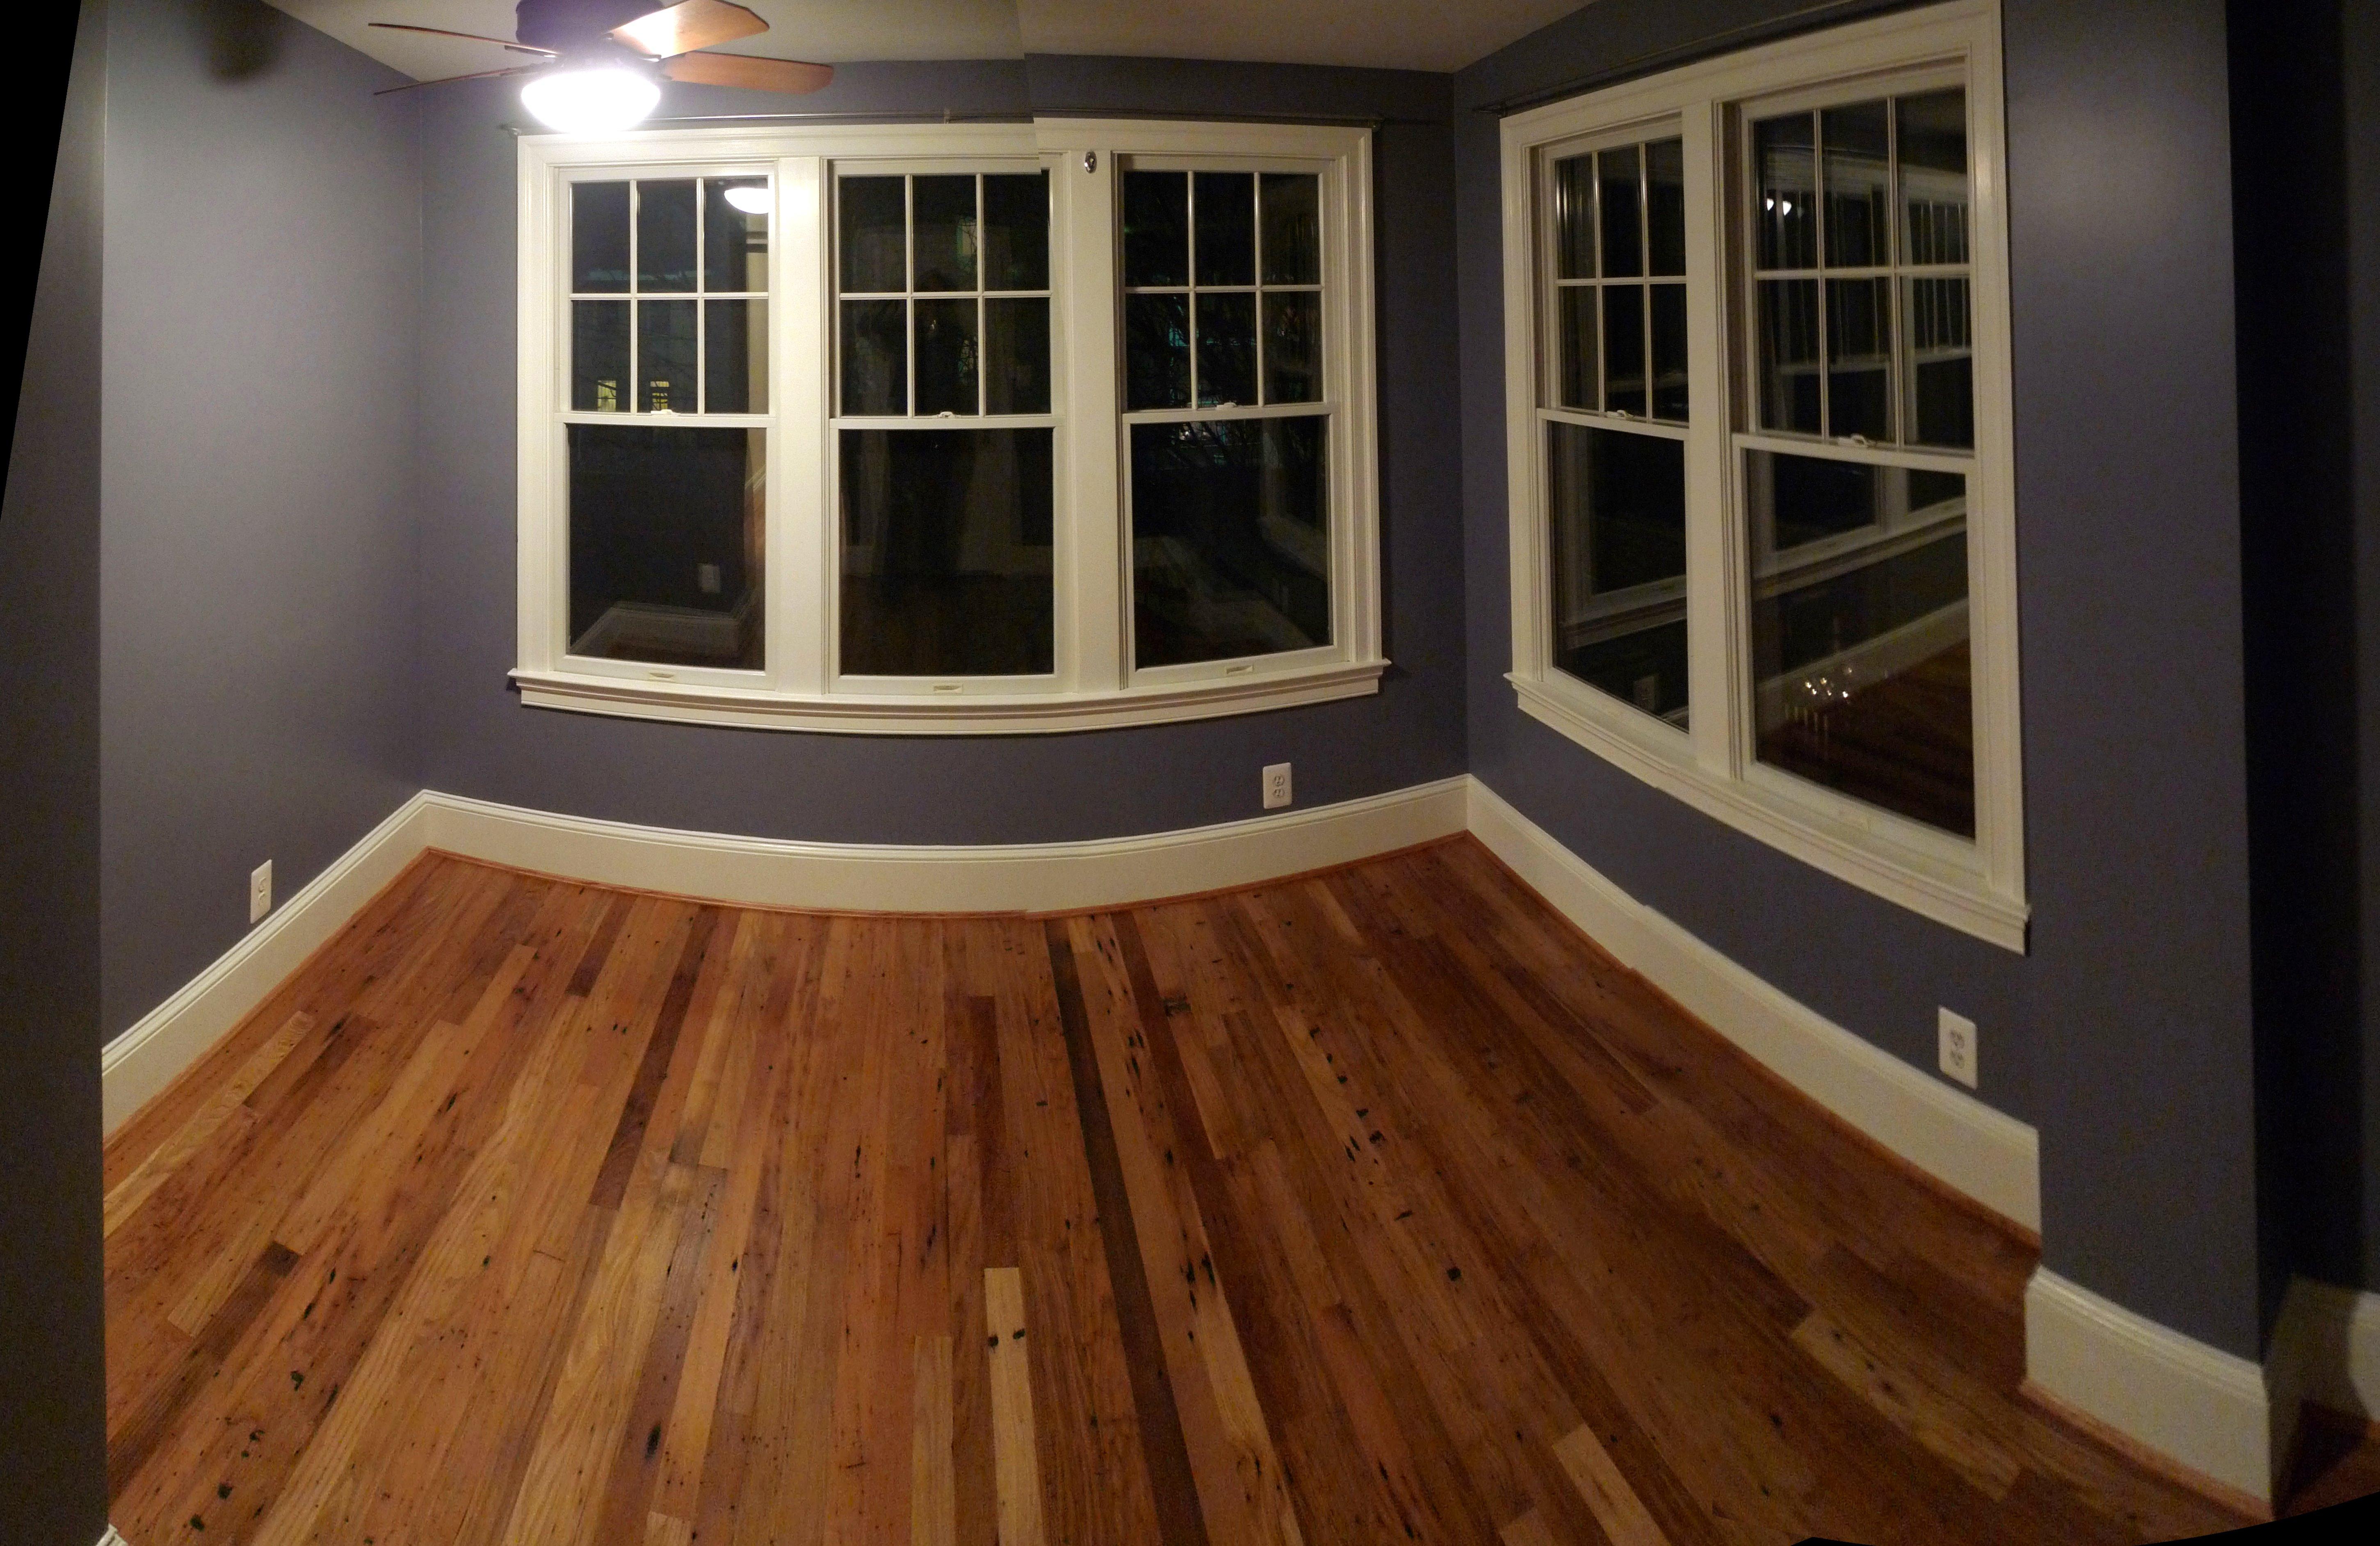 Hardwood floor with custom specifications